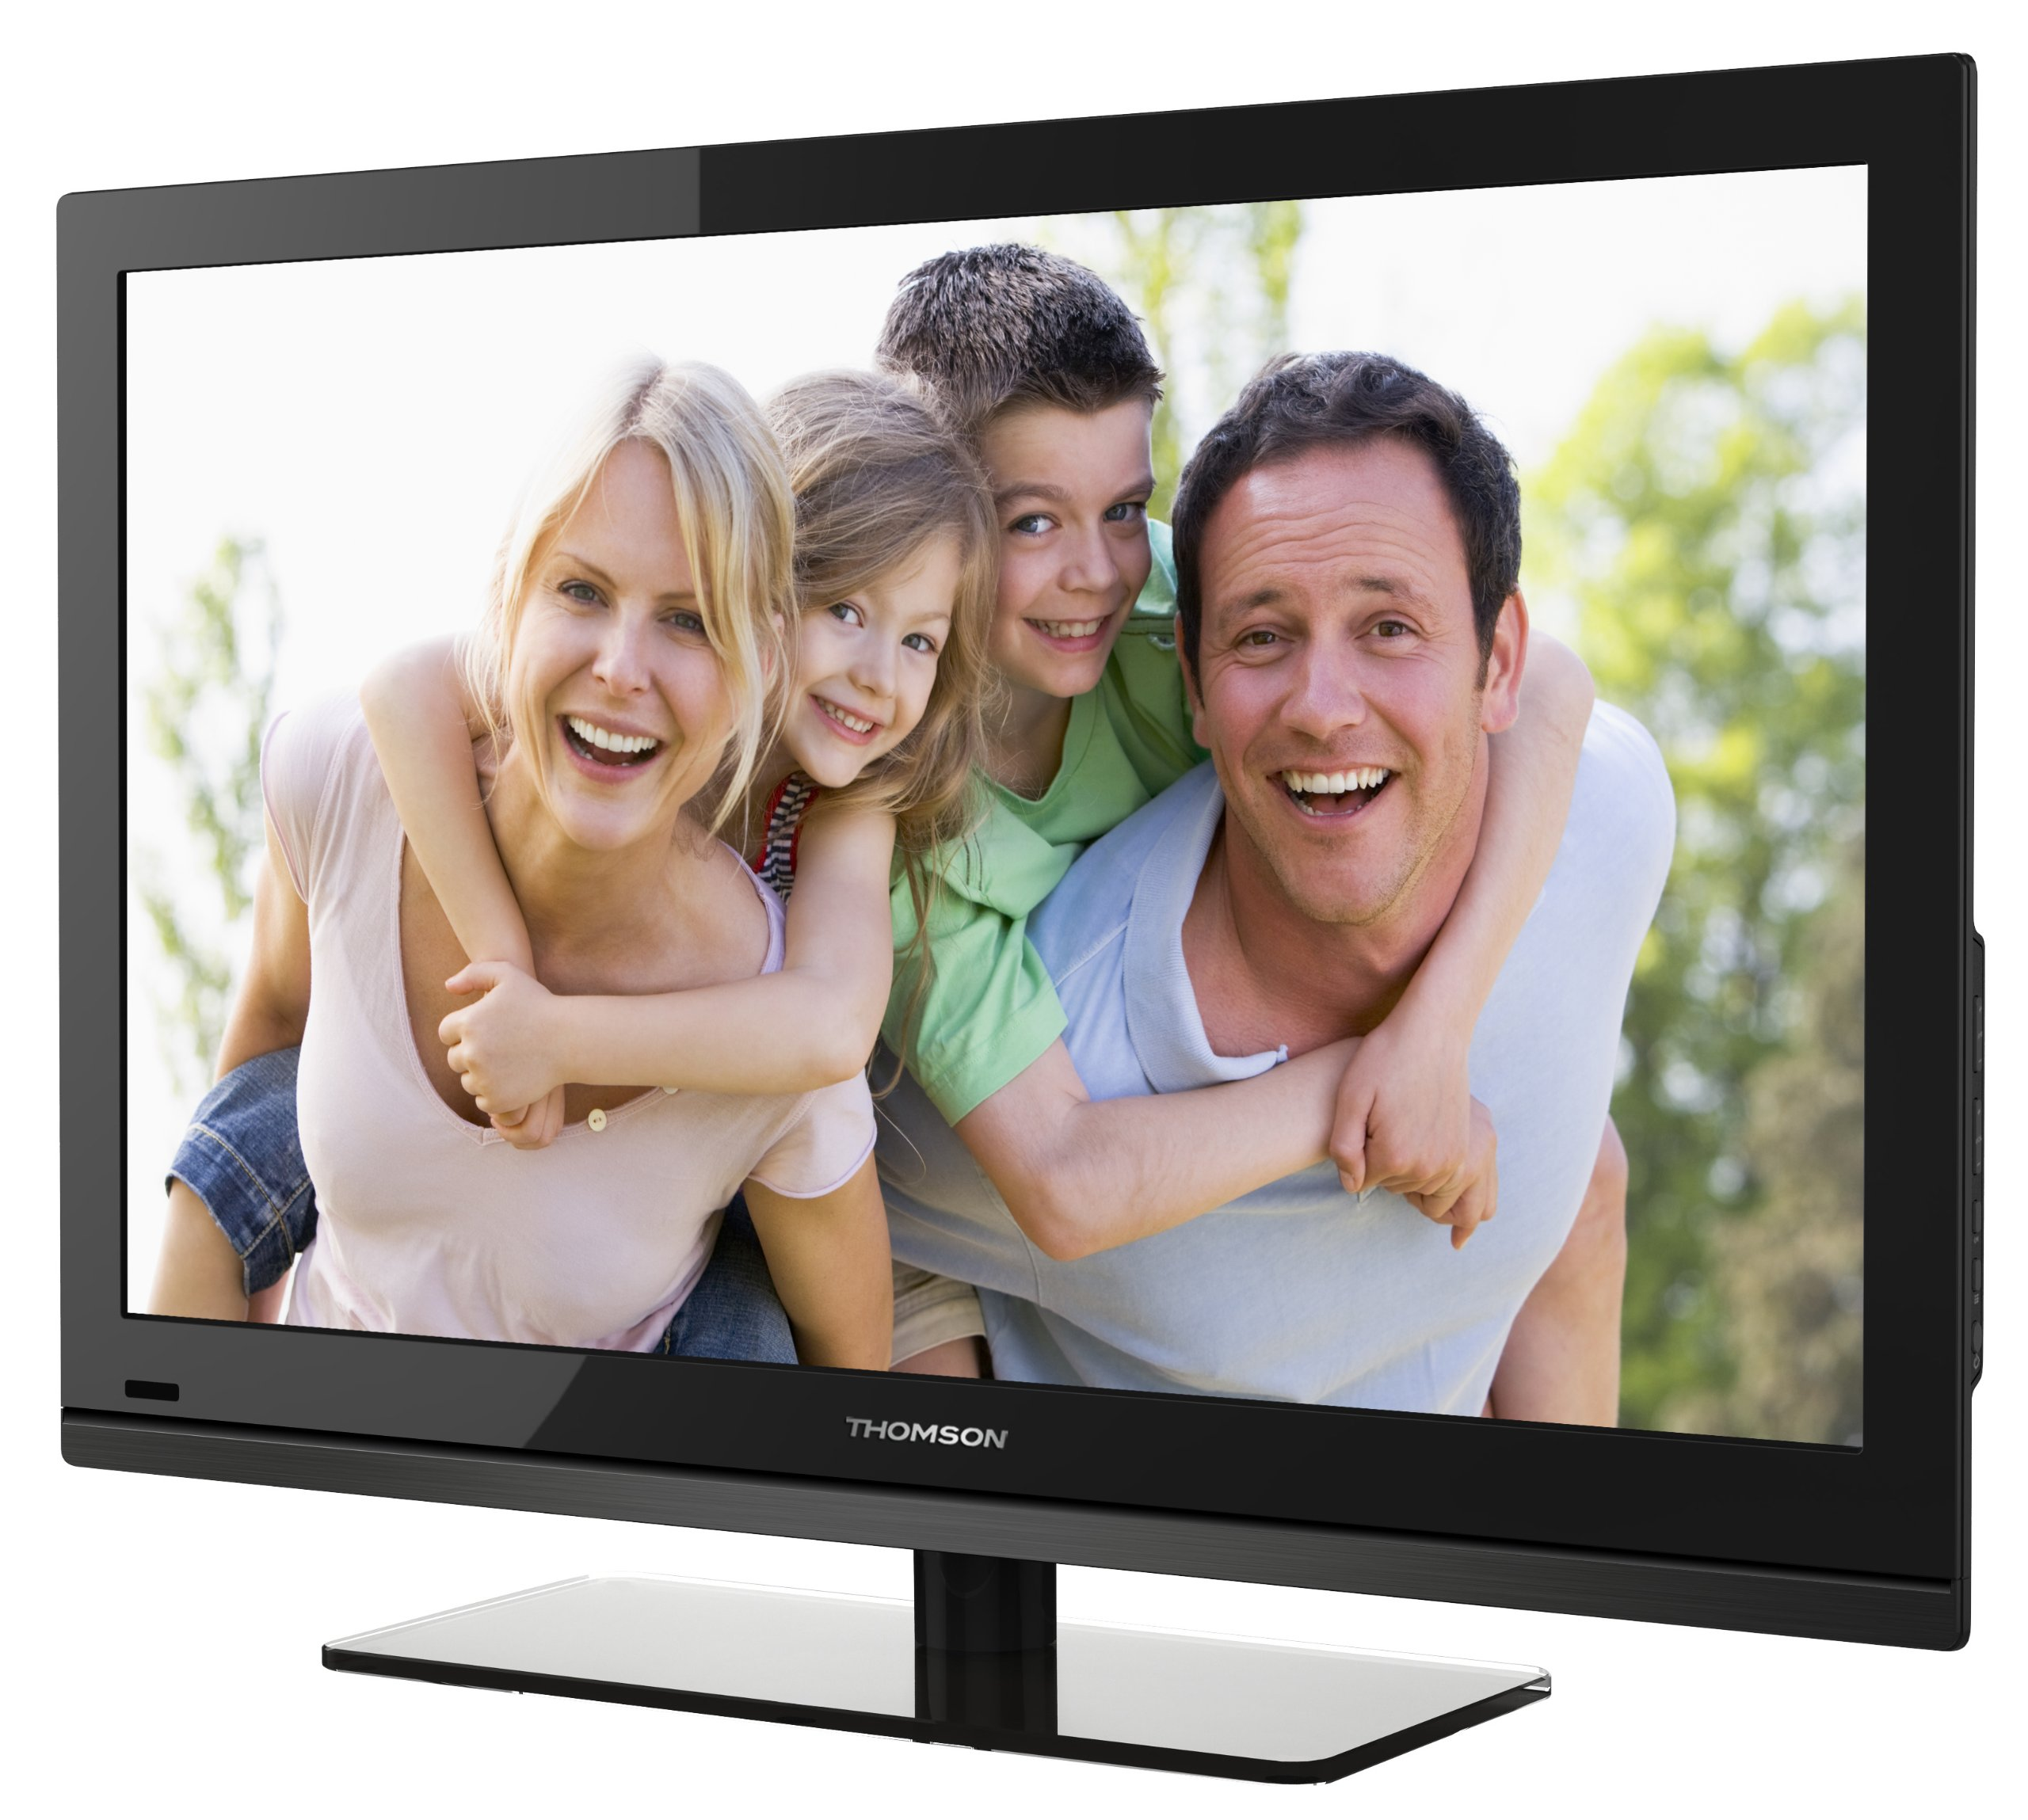 Thomson 40FT4253 - Televisor LED Full HD 40 pulgadas: Amazon.es ...